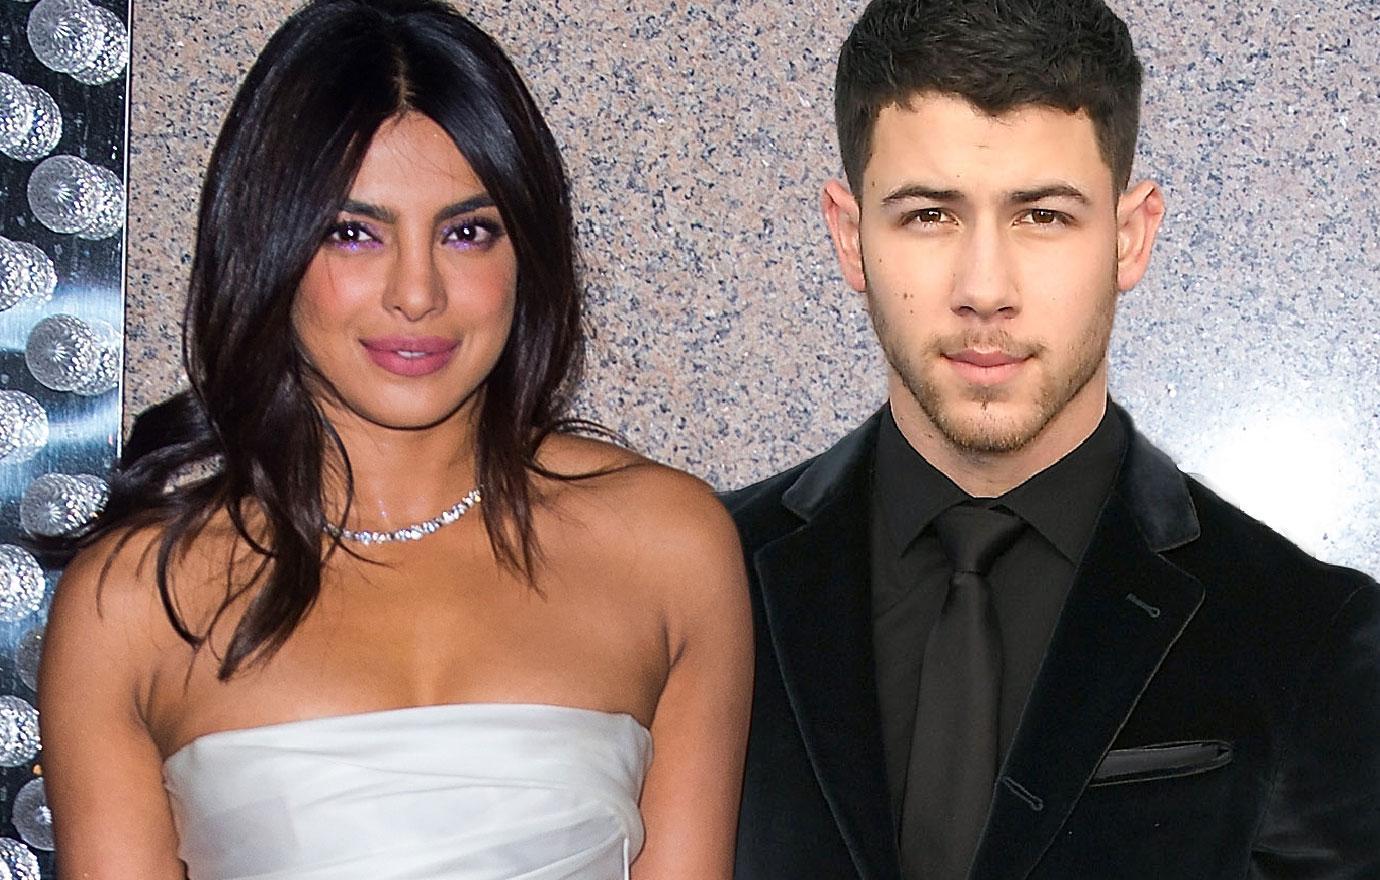 Nick Jonas And Priyanka Chopra Are Married